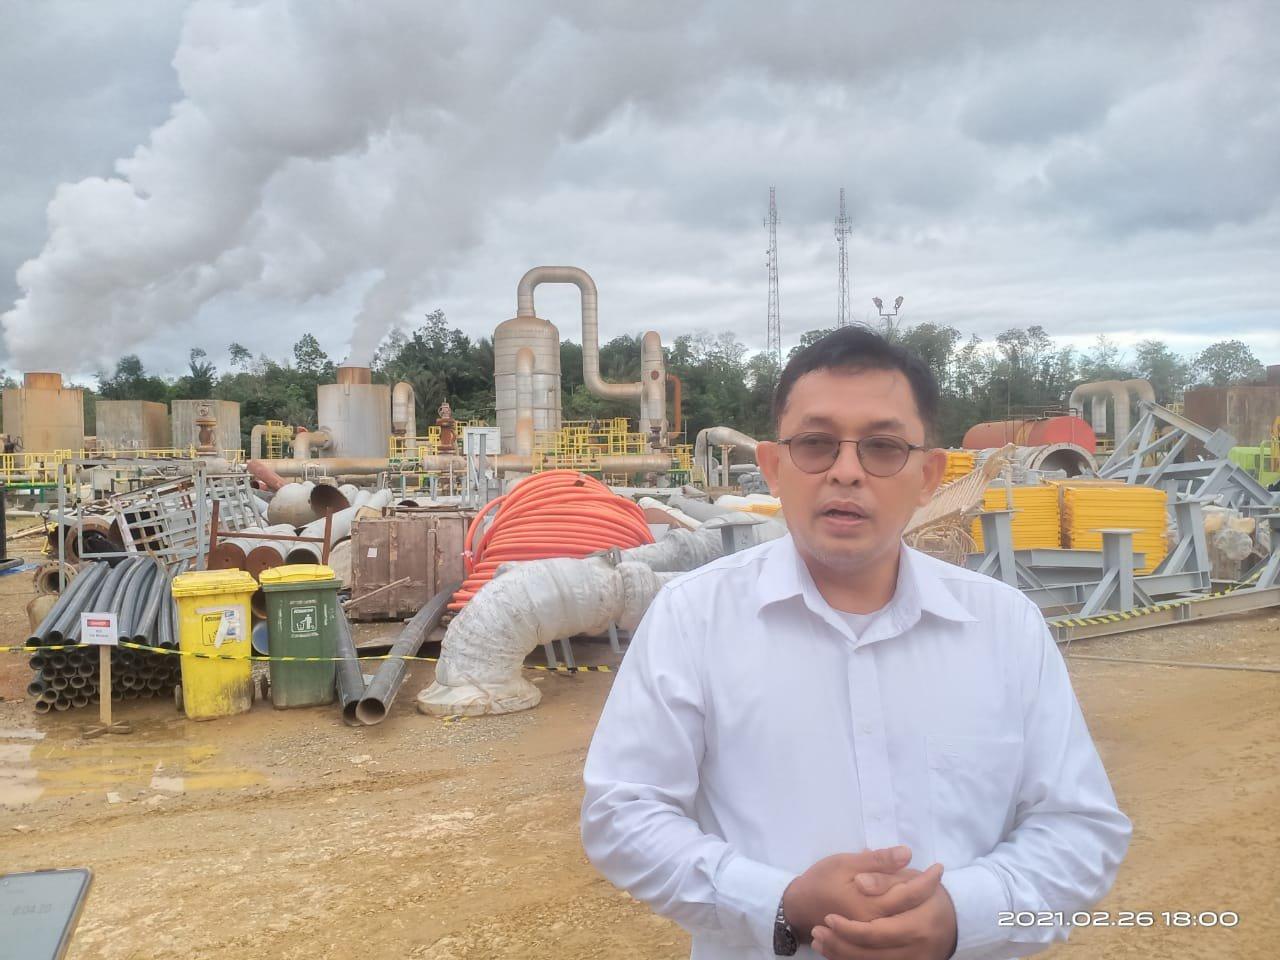 PT SMGP Targetkan Akhir 2021 Supalai Listrik 140 MW